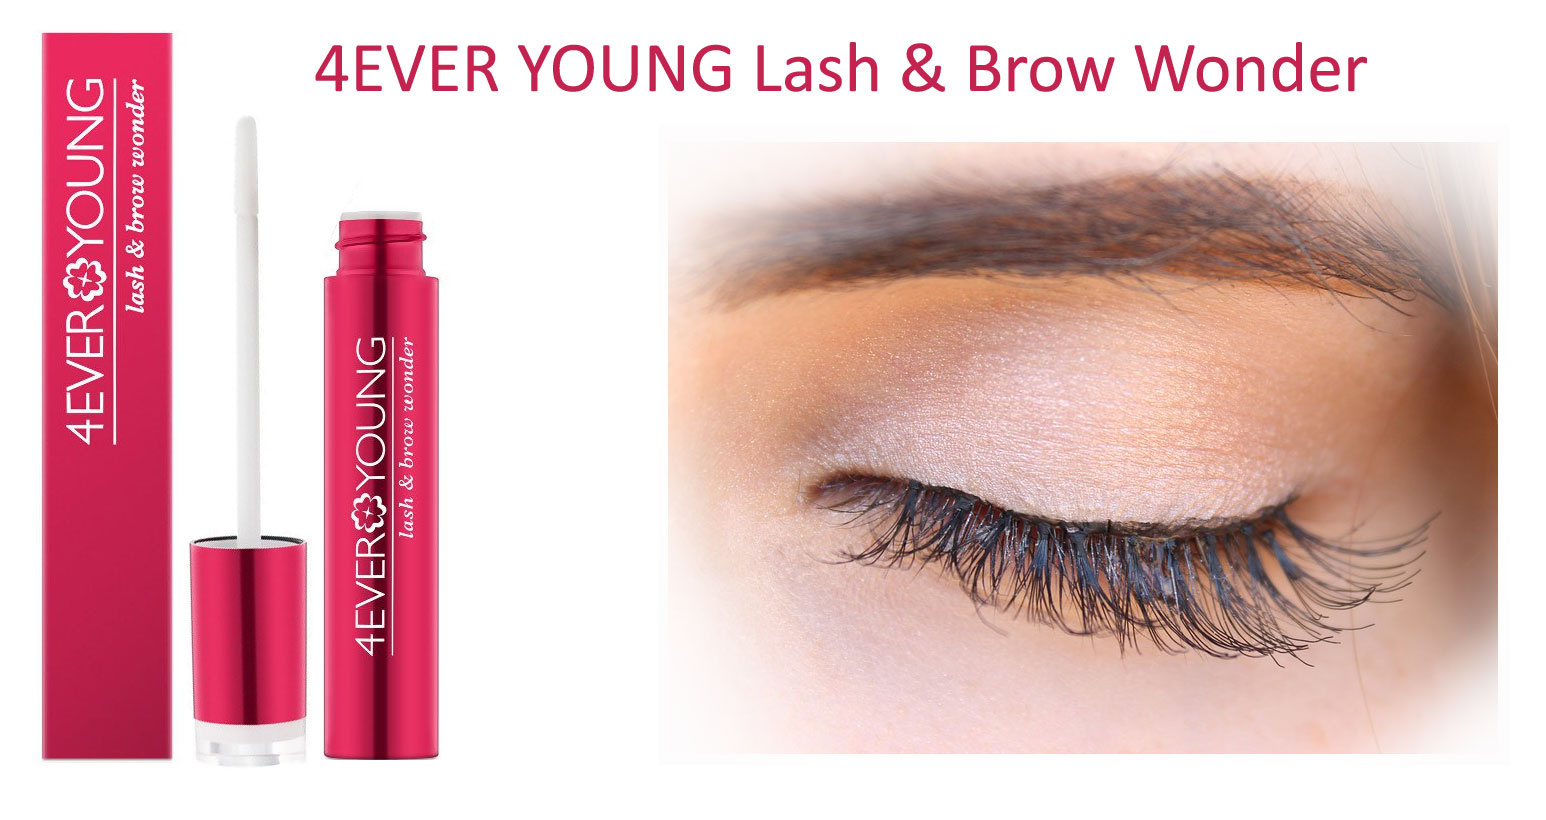 4EVER YOUNG Lash & Brow Wonder